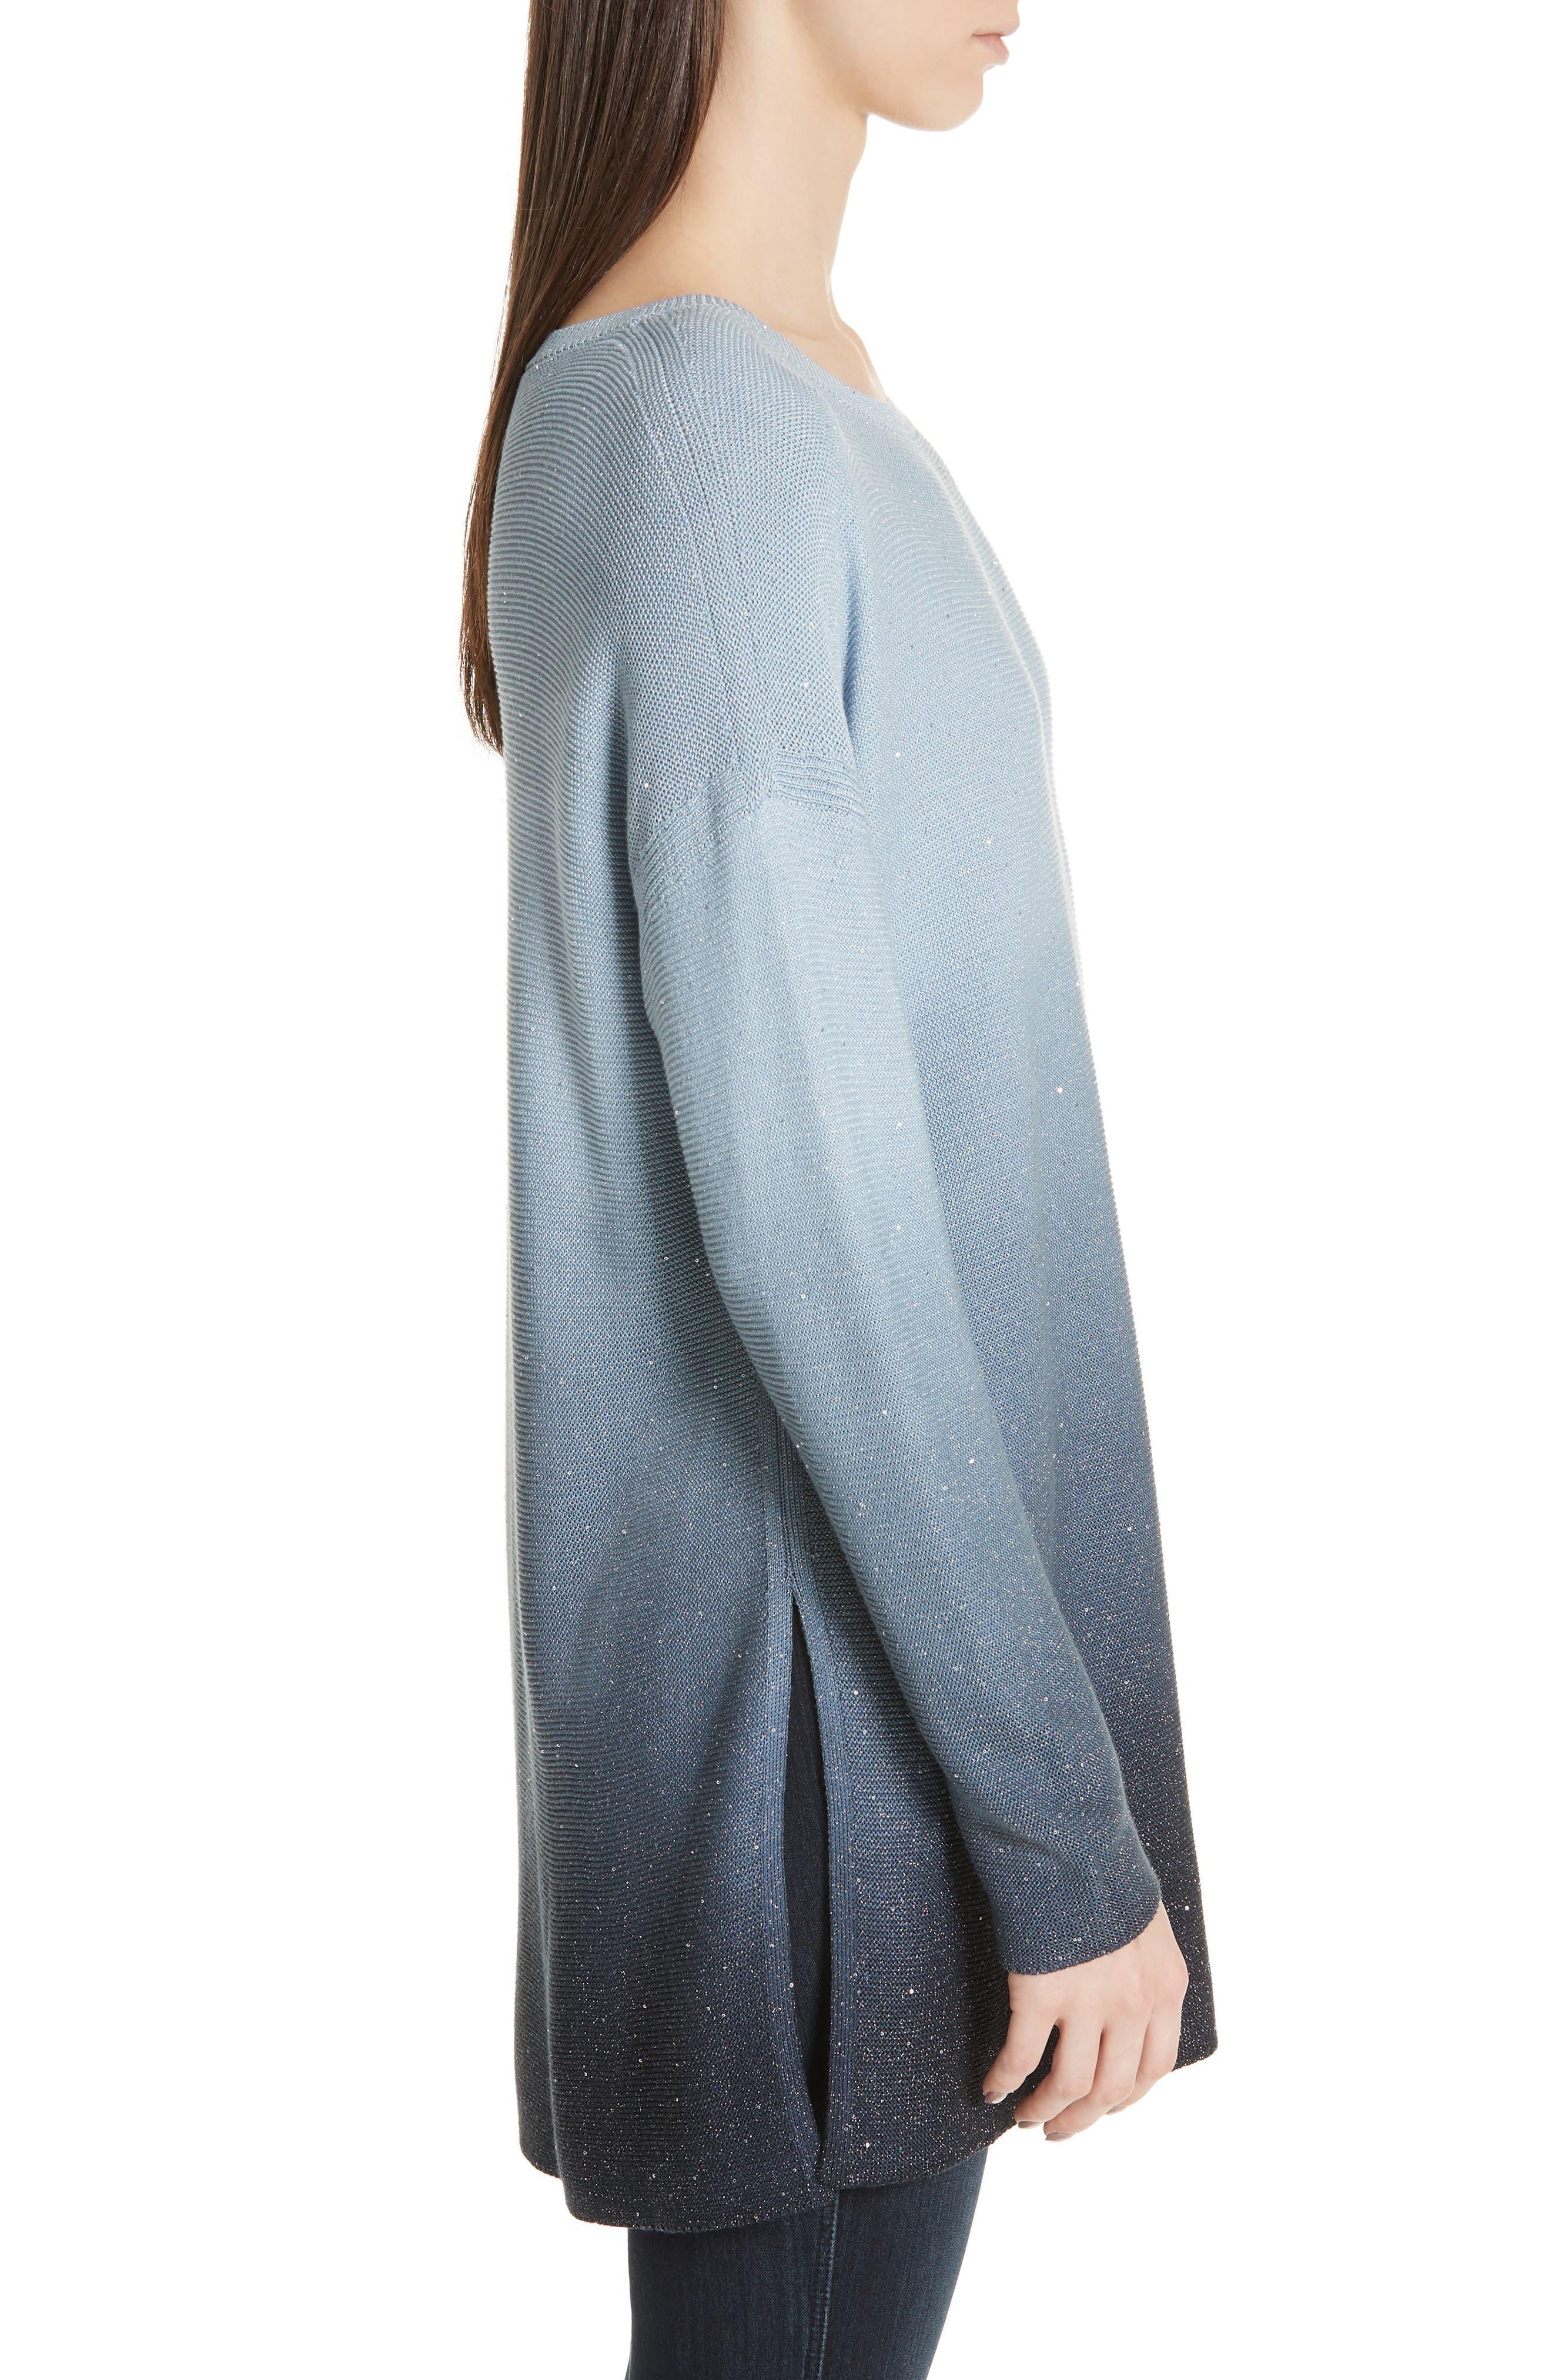 LAFAYETTE 148 NEW YORK, Sequin Ombré Silk Blend Tunic, Alternate thumbnail 3, color, SLATE BLUE MULTI